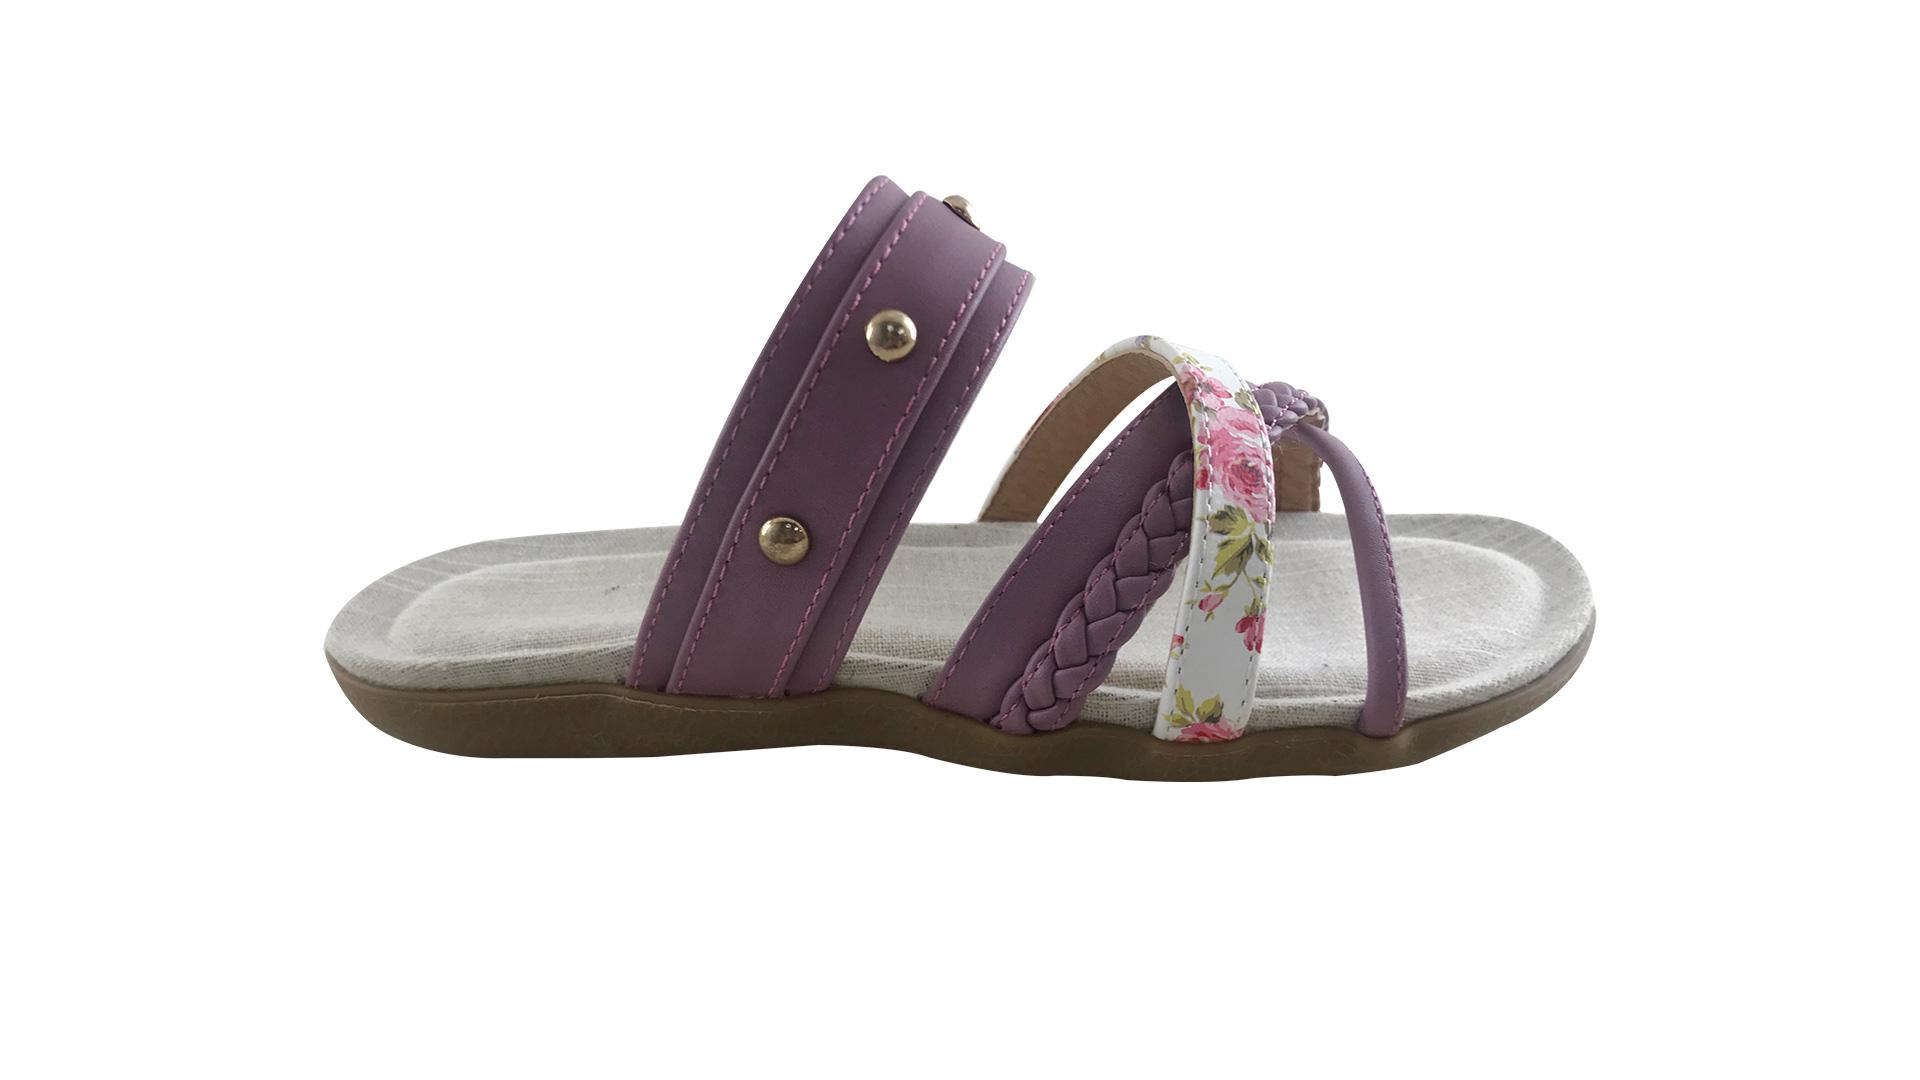 Flower Sandals Women' Leather Flat 2020